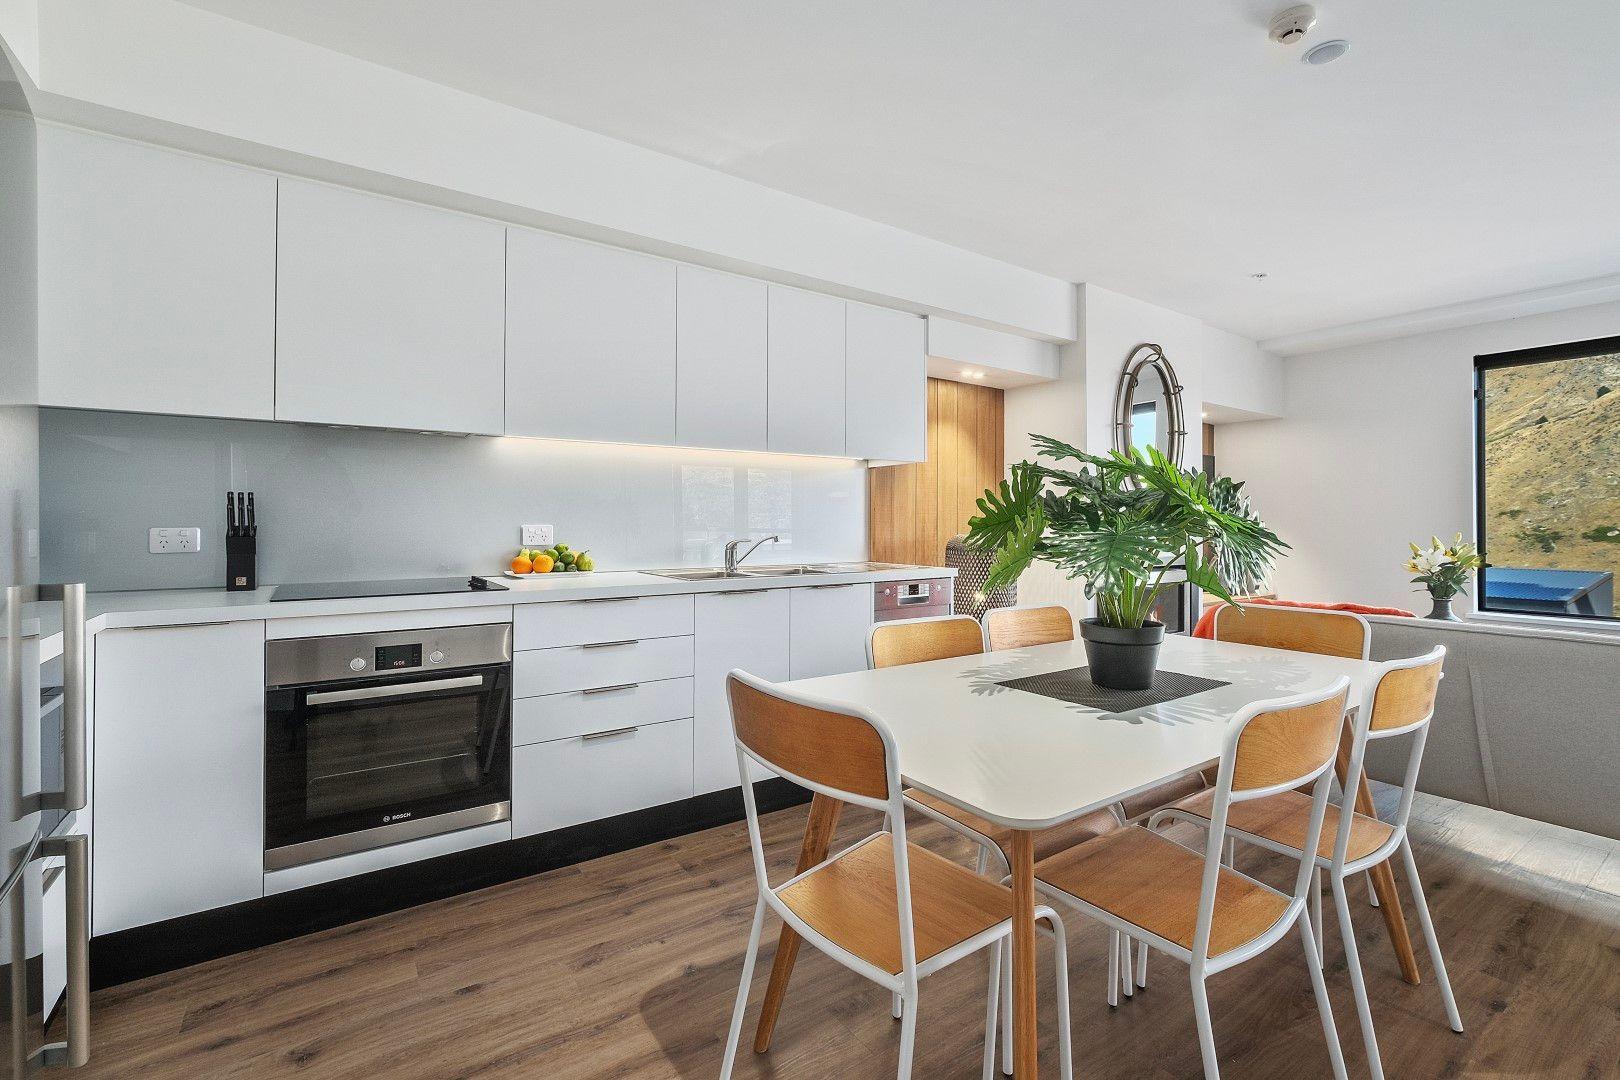 Coroshot - Apartment 10 @ Residence du Parc